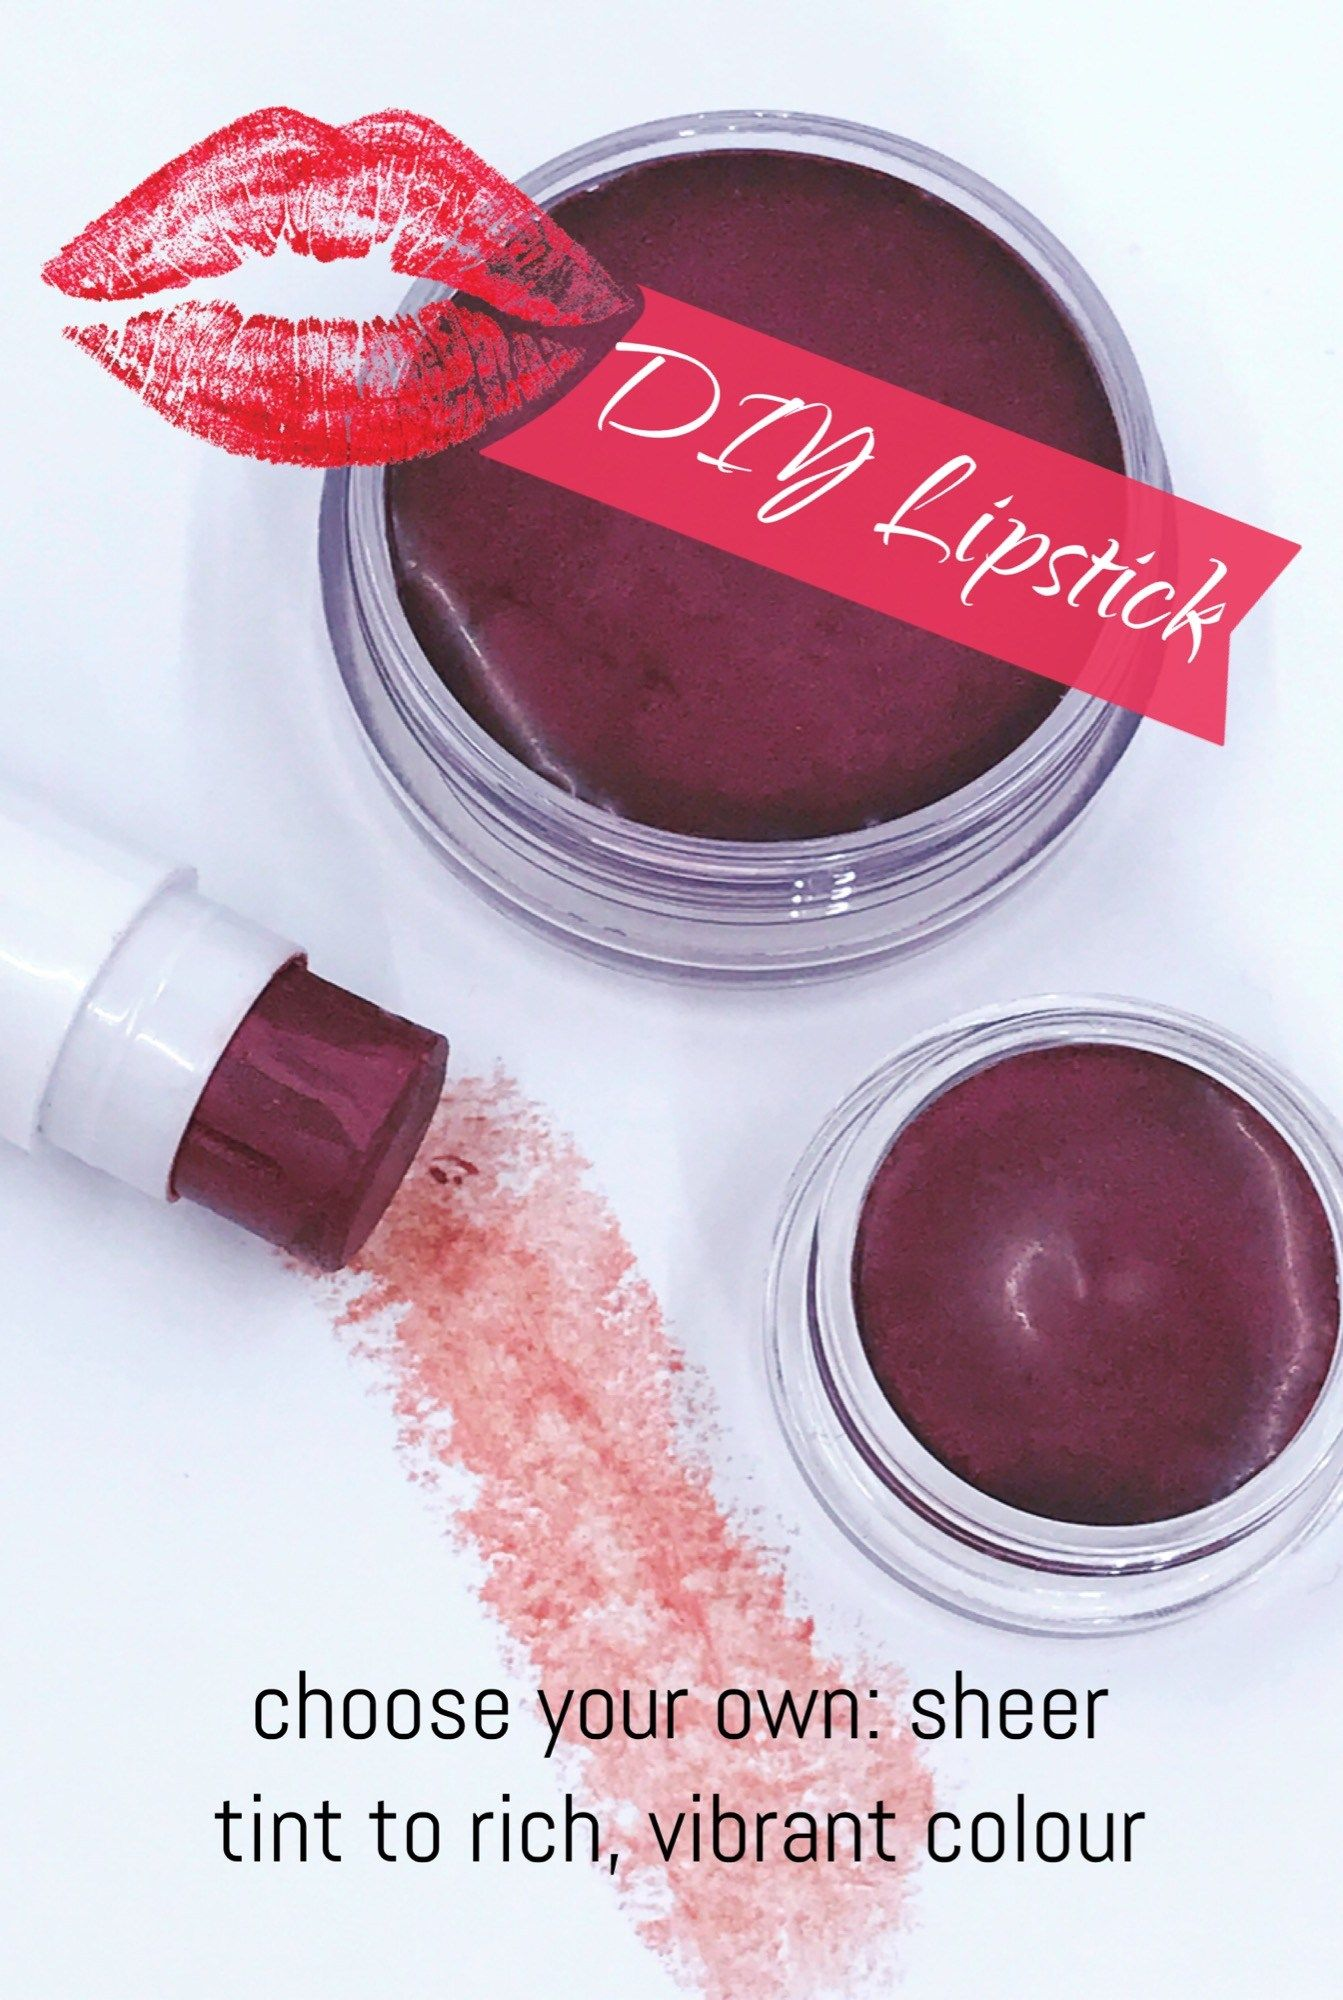 Diy lipstick in 2020 diy lipstick homemade lipstick